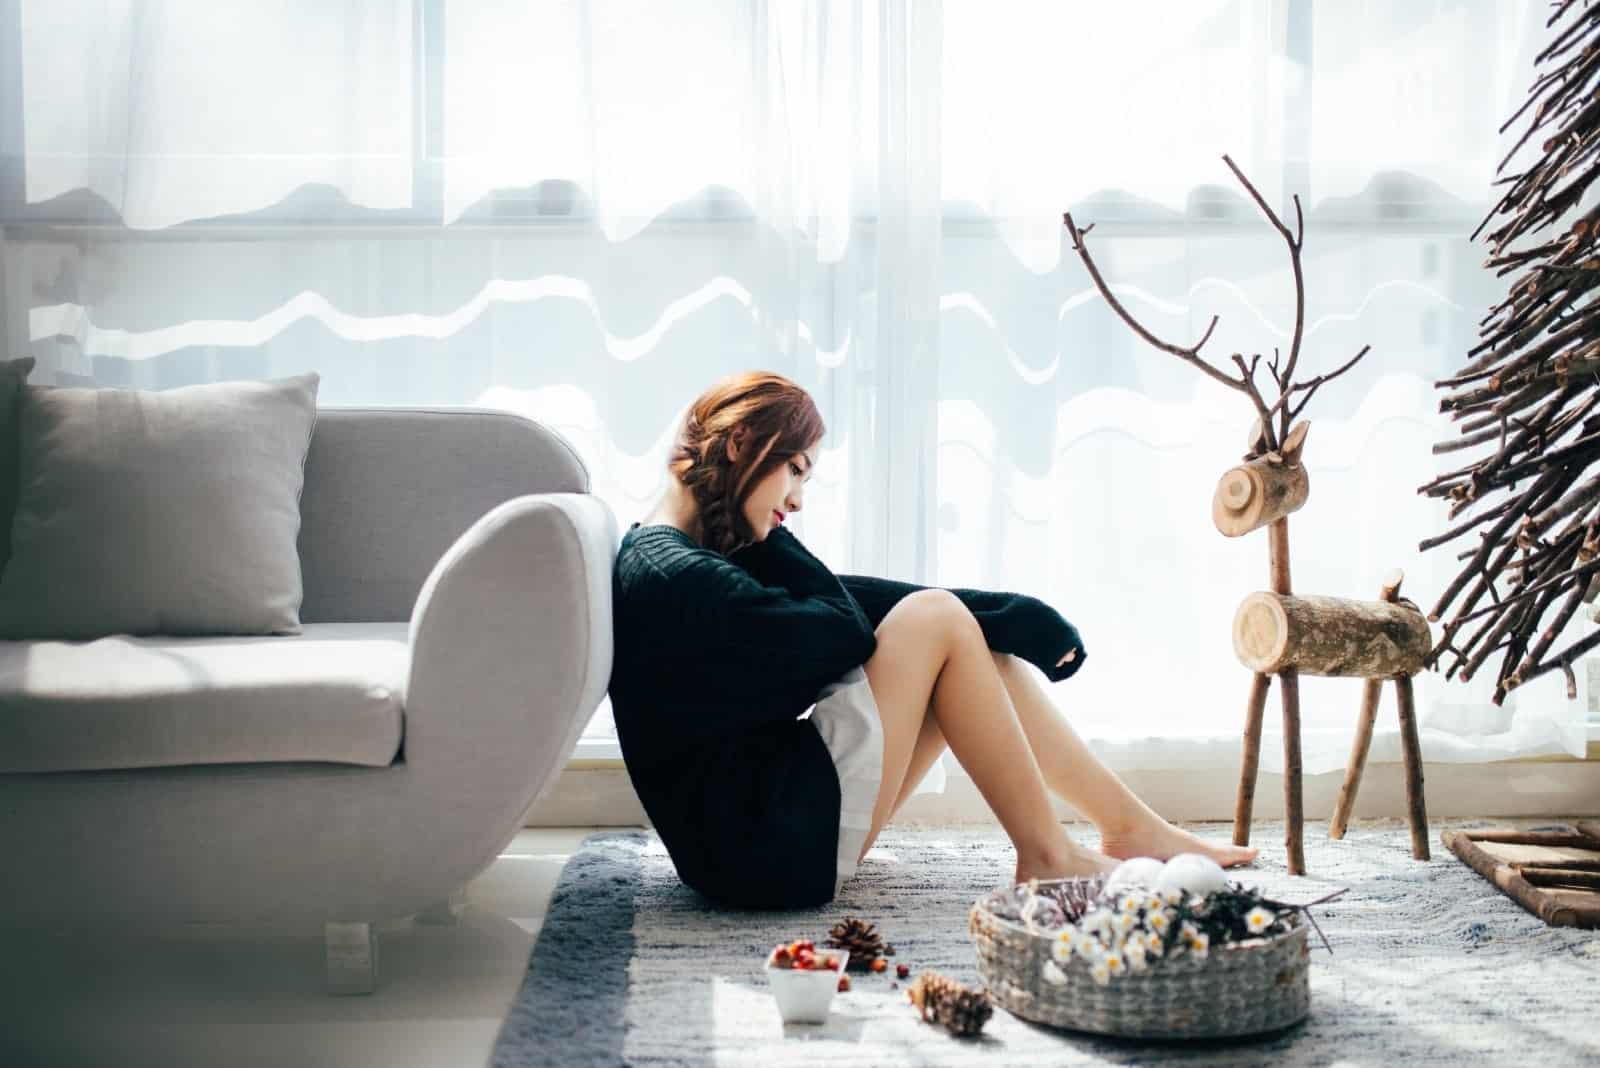 sad woman leaning on sofa while sitting on carpet